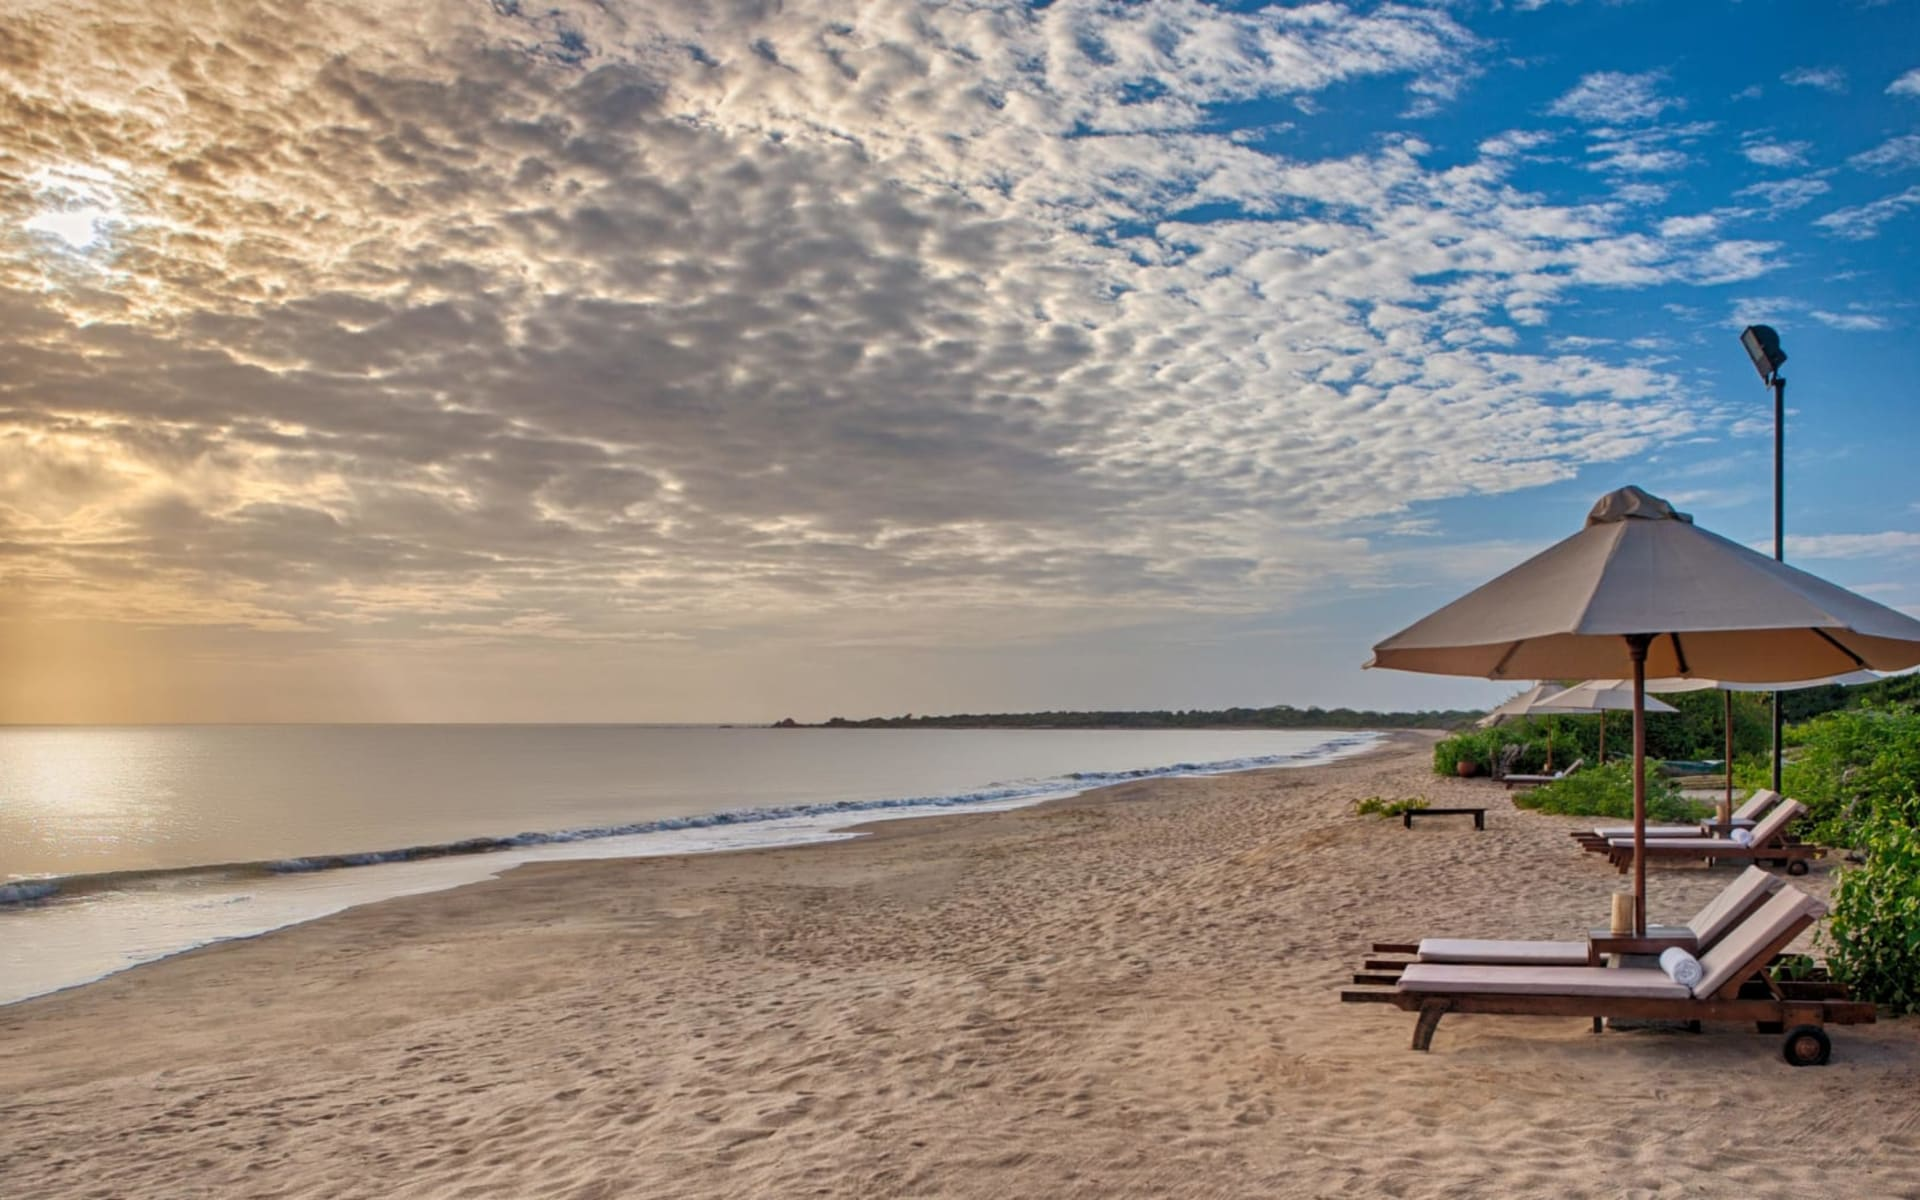 Jungle Beach by Uga Escapes in Trincomalee: